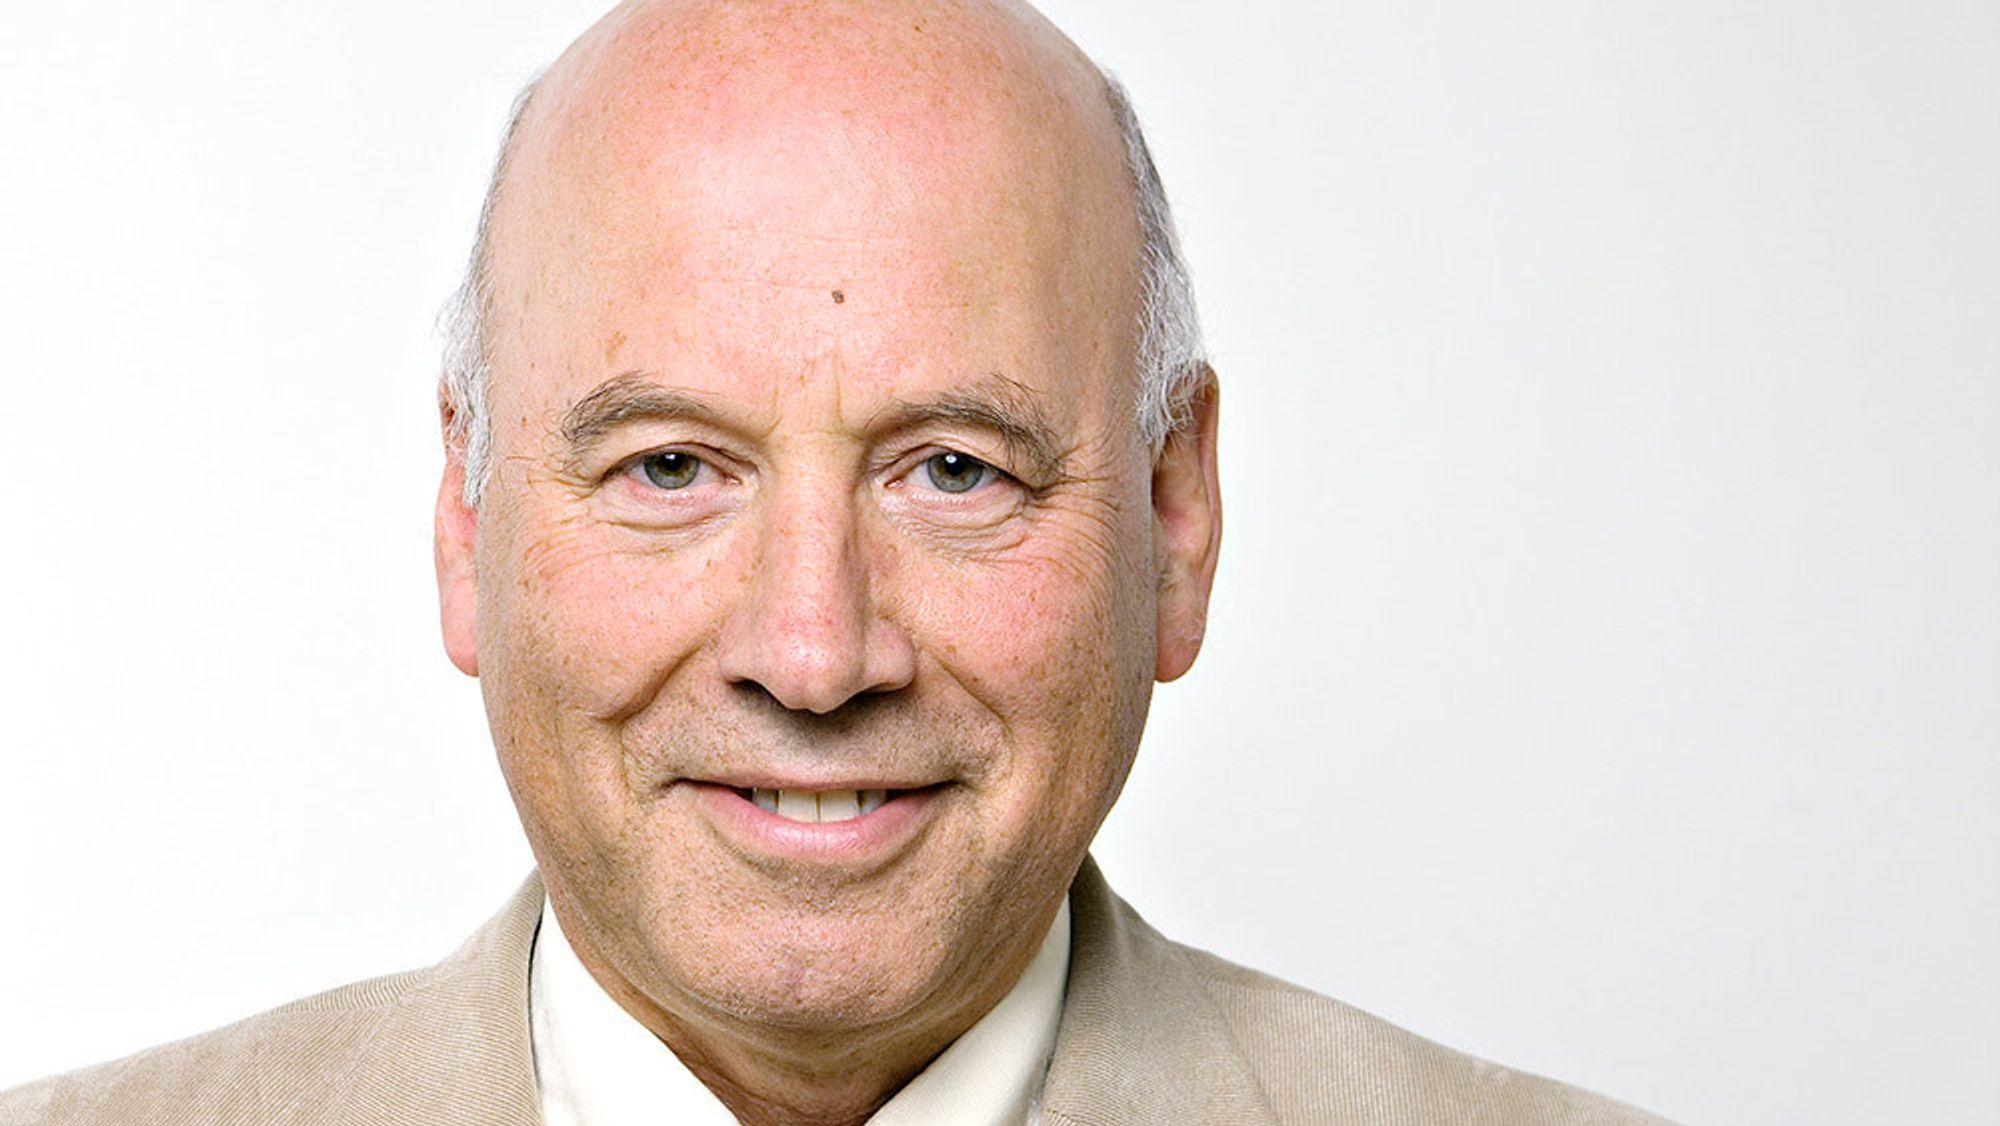 Are Holen er både psykolog og psykiater, og professor emeritus ved Institutt for psykisk helse ved NTNU.